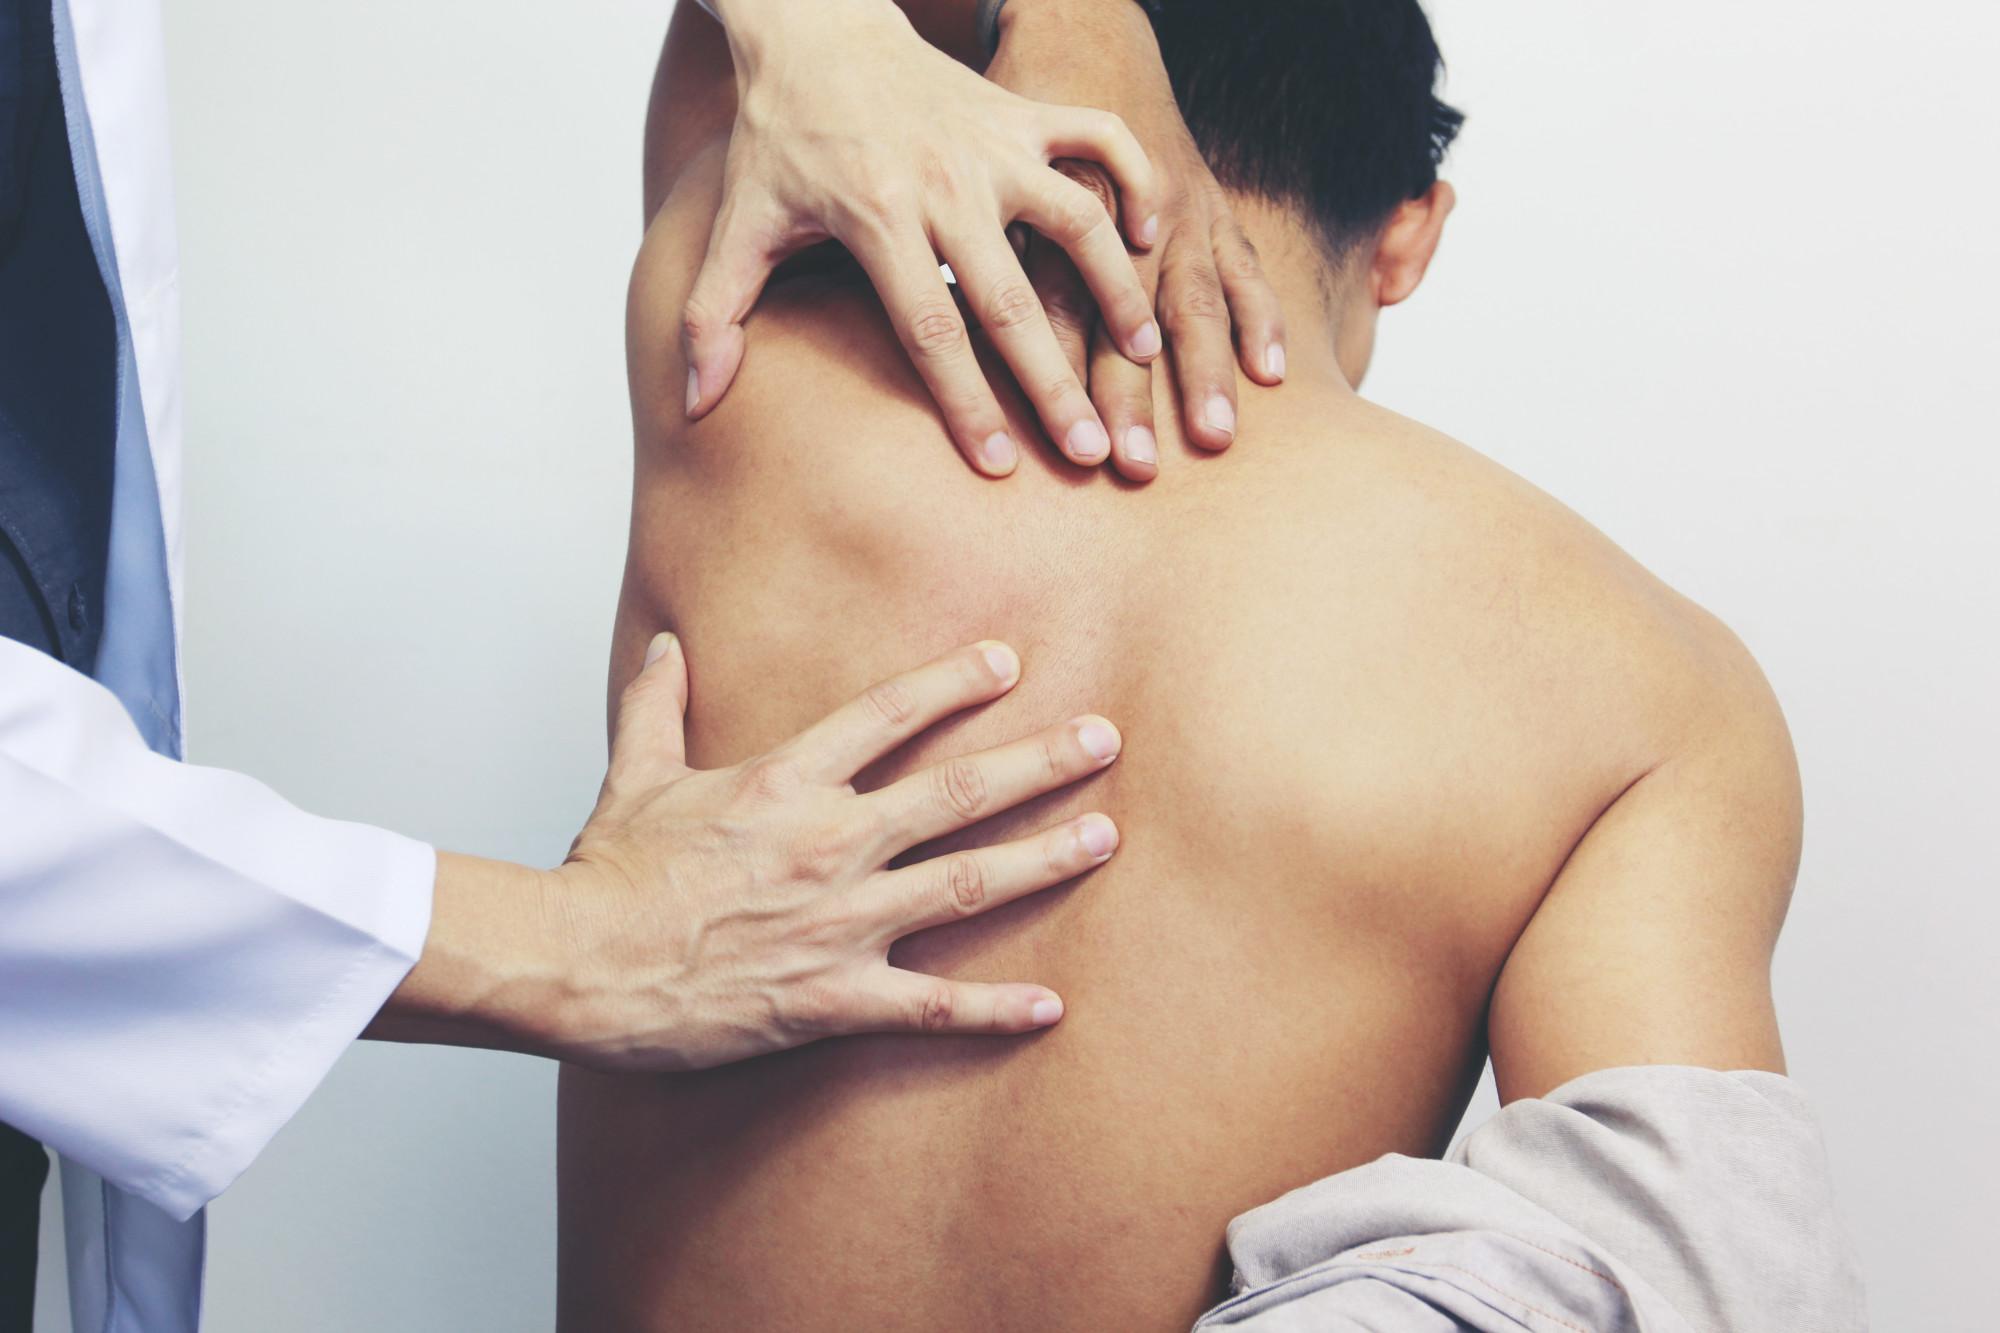 4K - Chiropractic Neck Adjustment Montage - YouTube